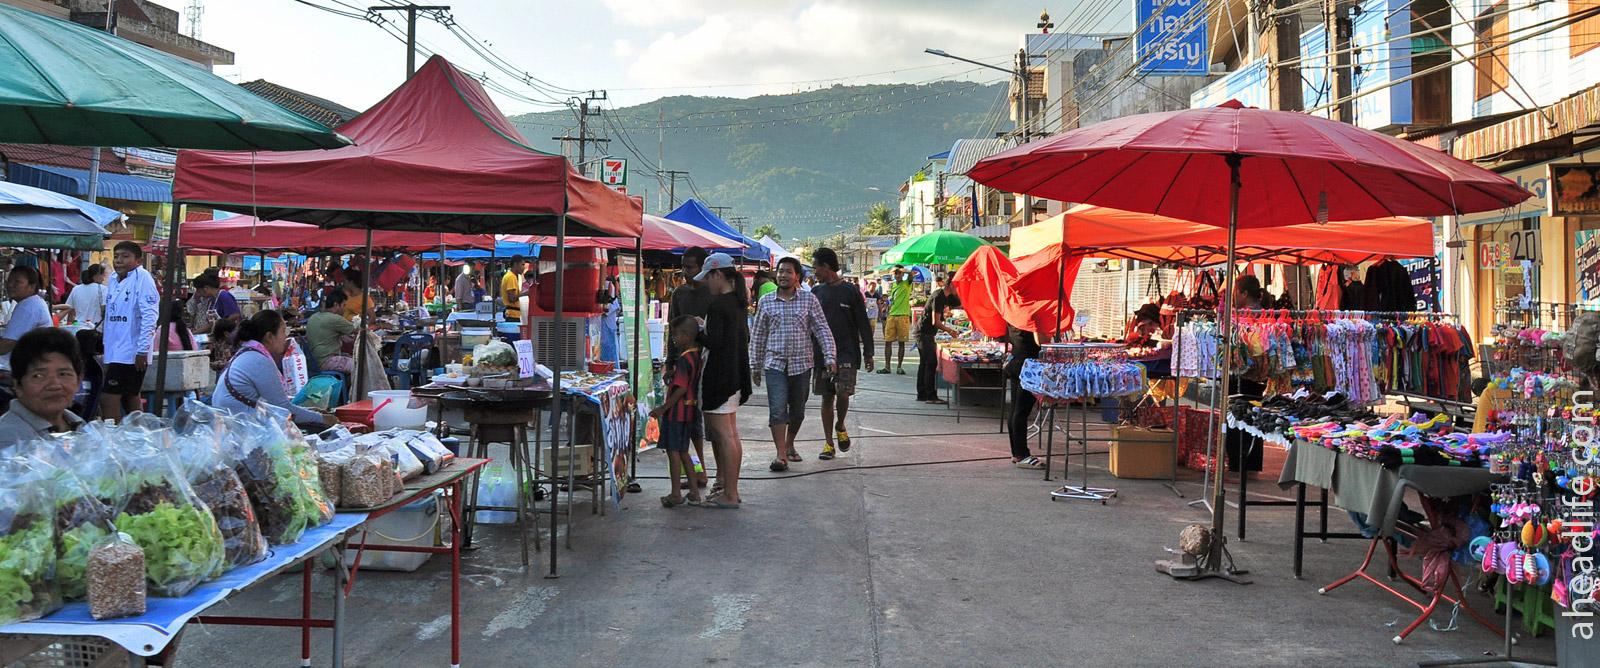 night market in Khanom